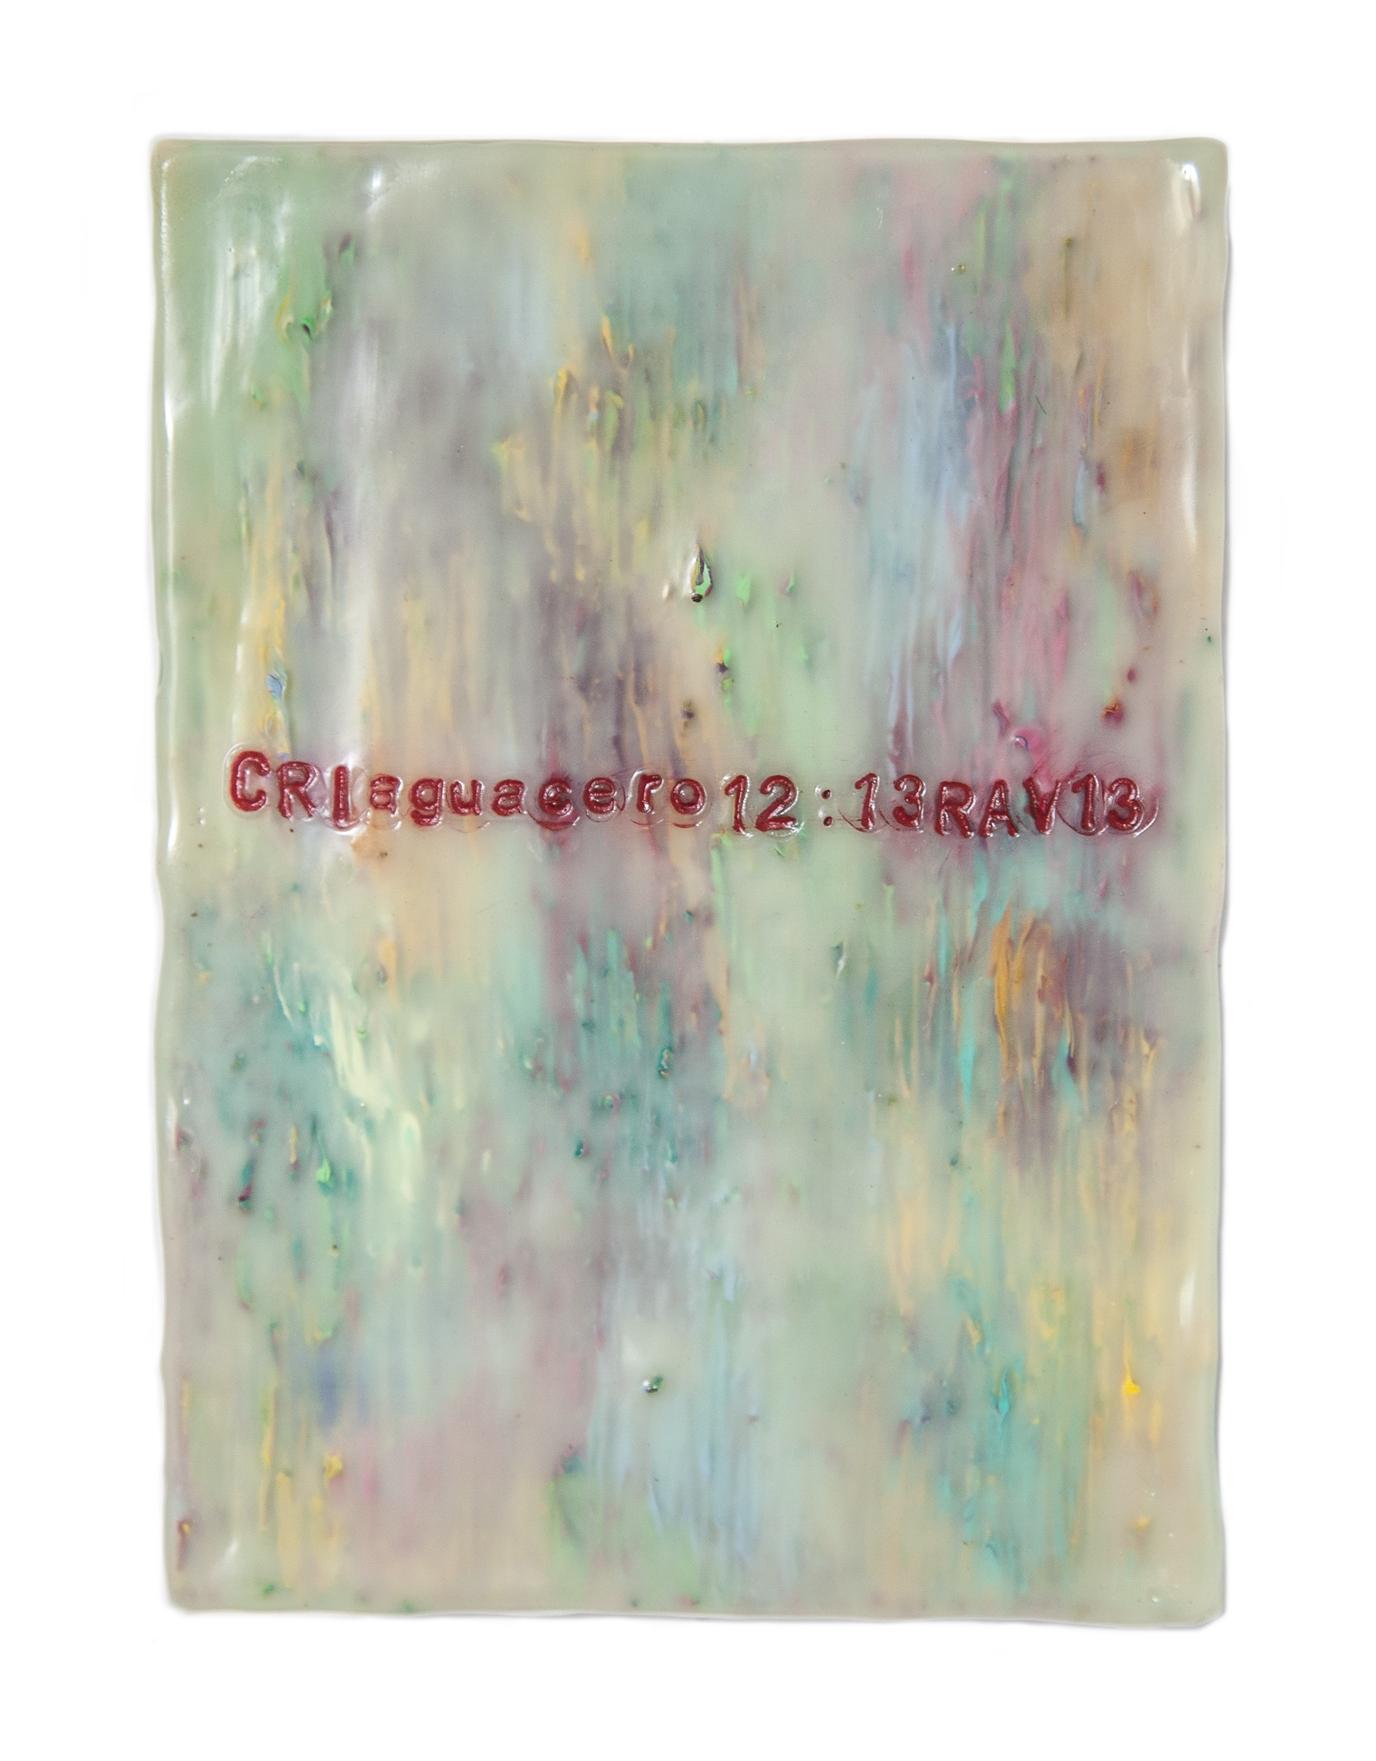 CRIaguacero12:13RAV13